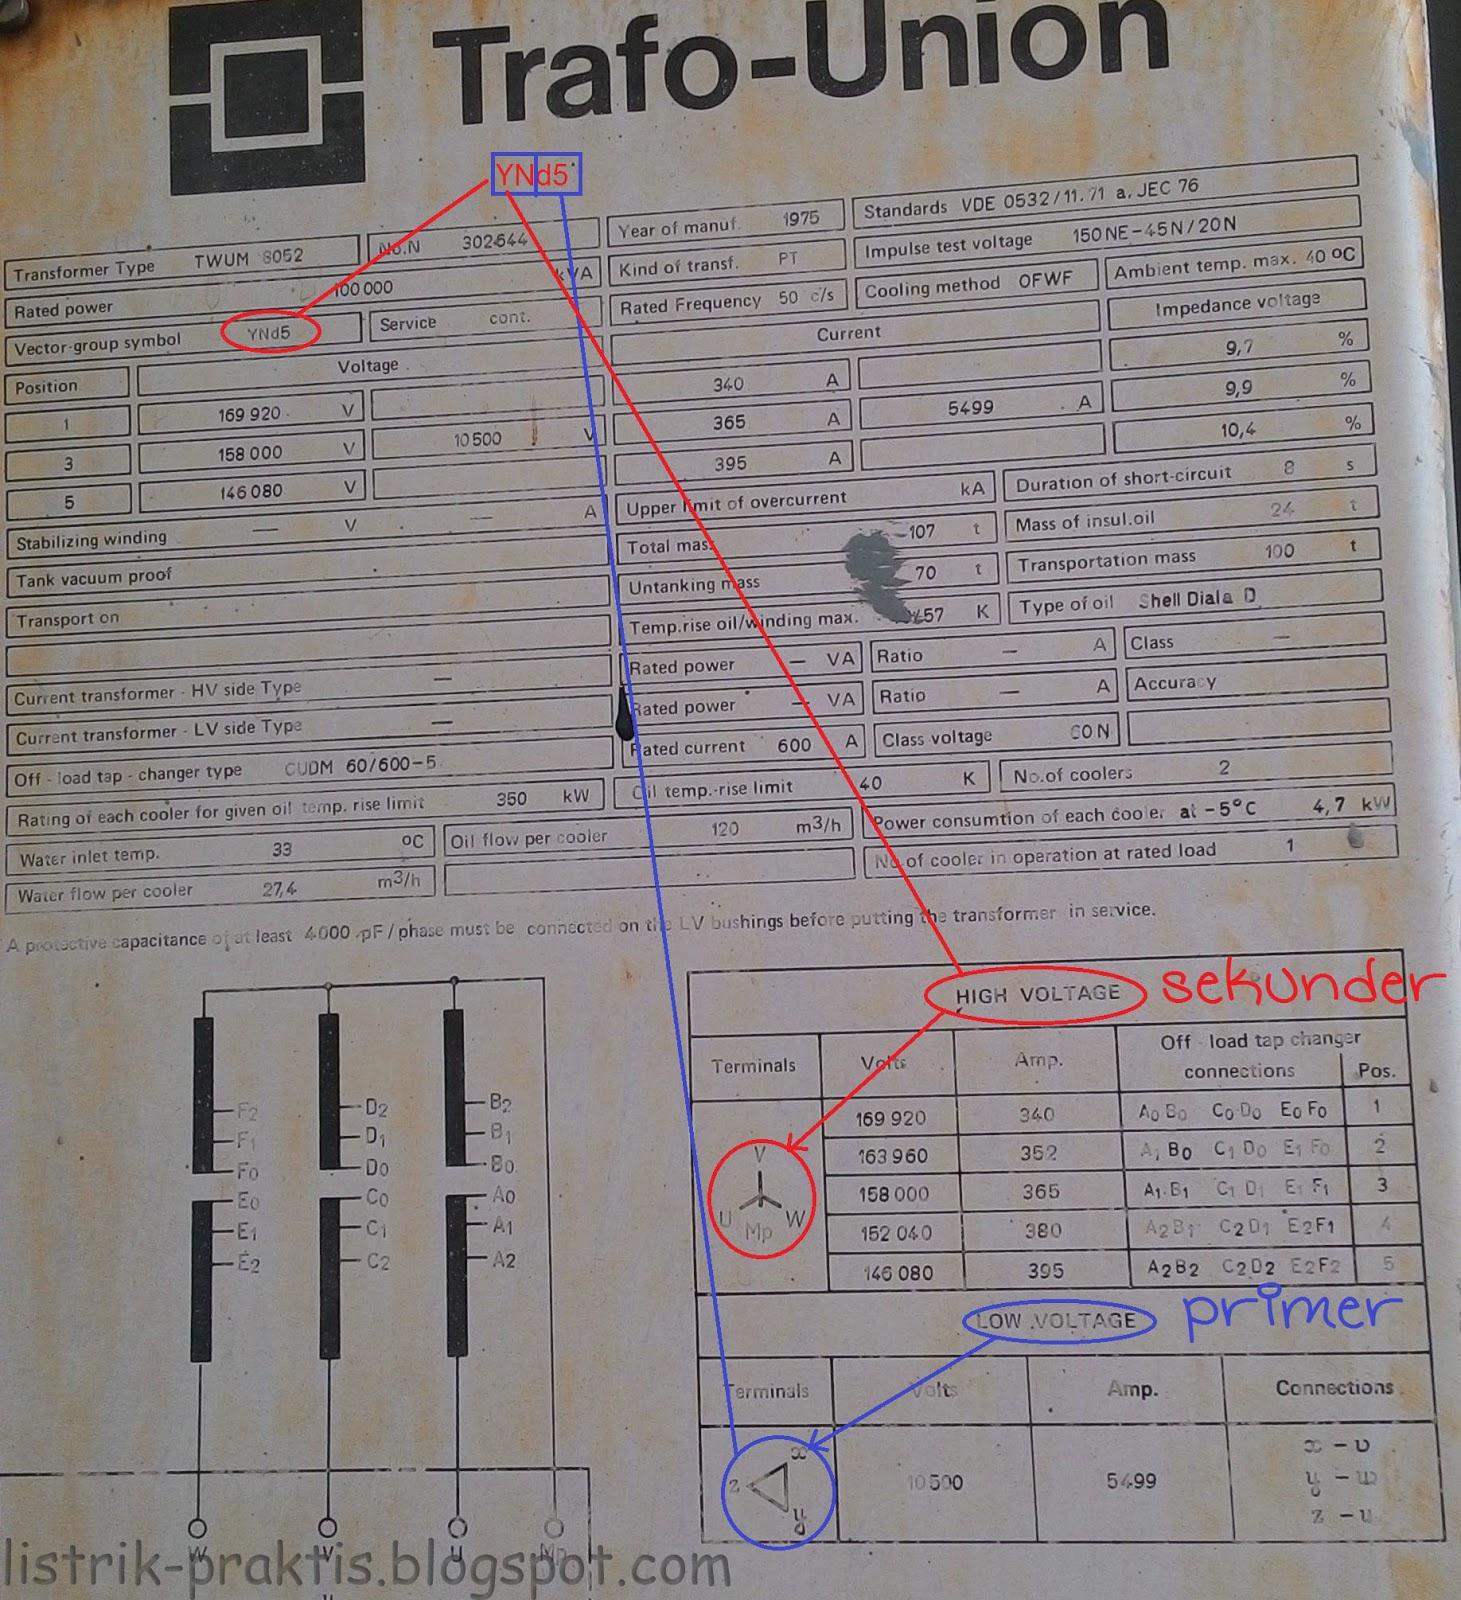 Fine Onan 5 0 Cck Wiring Diagram Photos - Wiring Diagram Ideas ... Wiring Onan Diagram Cck on briggs and stratton wiring diagram, liebherr wiring diagram, taylor wiring diagram, clark wiring diagram, karcher wiring diagram, transfer switch wiring diagram, atlas wiring diagram, sullair wiring diagram, sears wiring diagram, voltage regulator wiring diagram, rv wiring diagram, gilson wiring diagram, schematic wiring diagram, ignition coil wiring diagram, dorman wiring diagram, bomag wiring diagram, generator wiring diagram, detroit wiring diagram, lesco wiring diagram, bush hog wiring diagram,